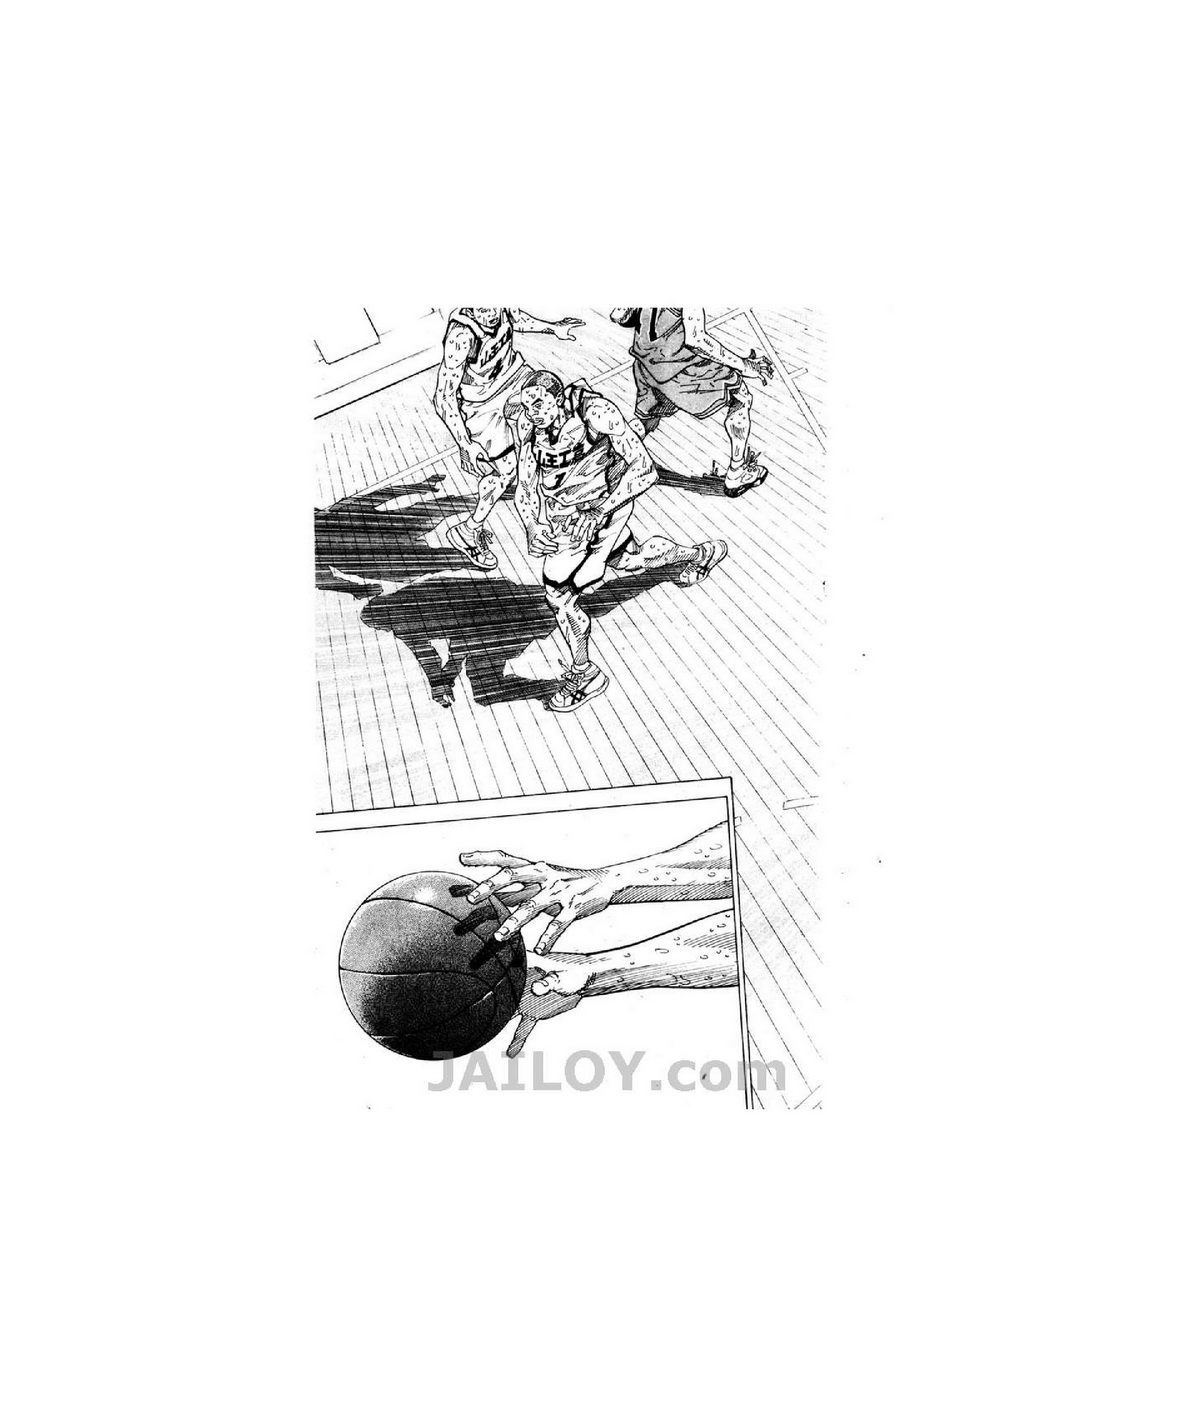 Slamdunk สแลมดังก์ เล่มที่ 31 [End] TH แปลไทย อ่านการ์ตูน